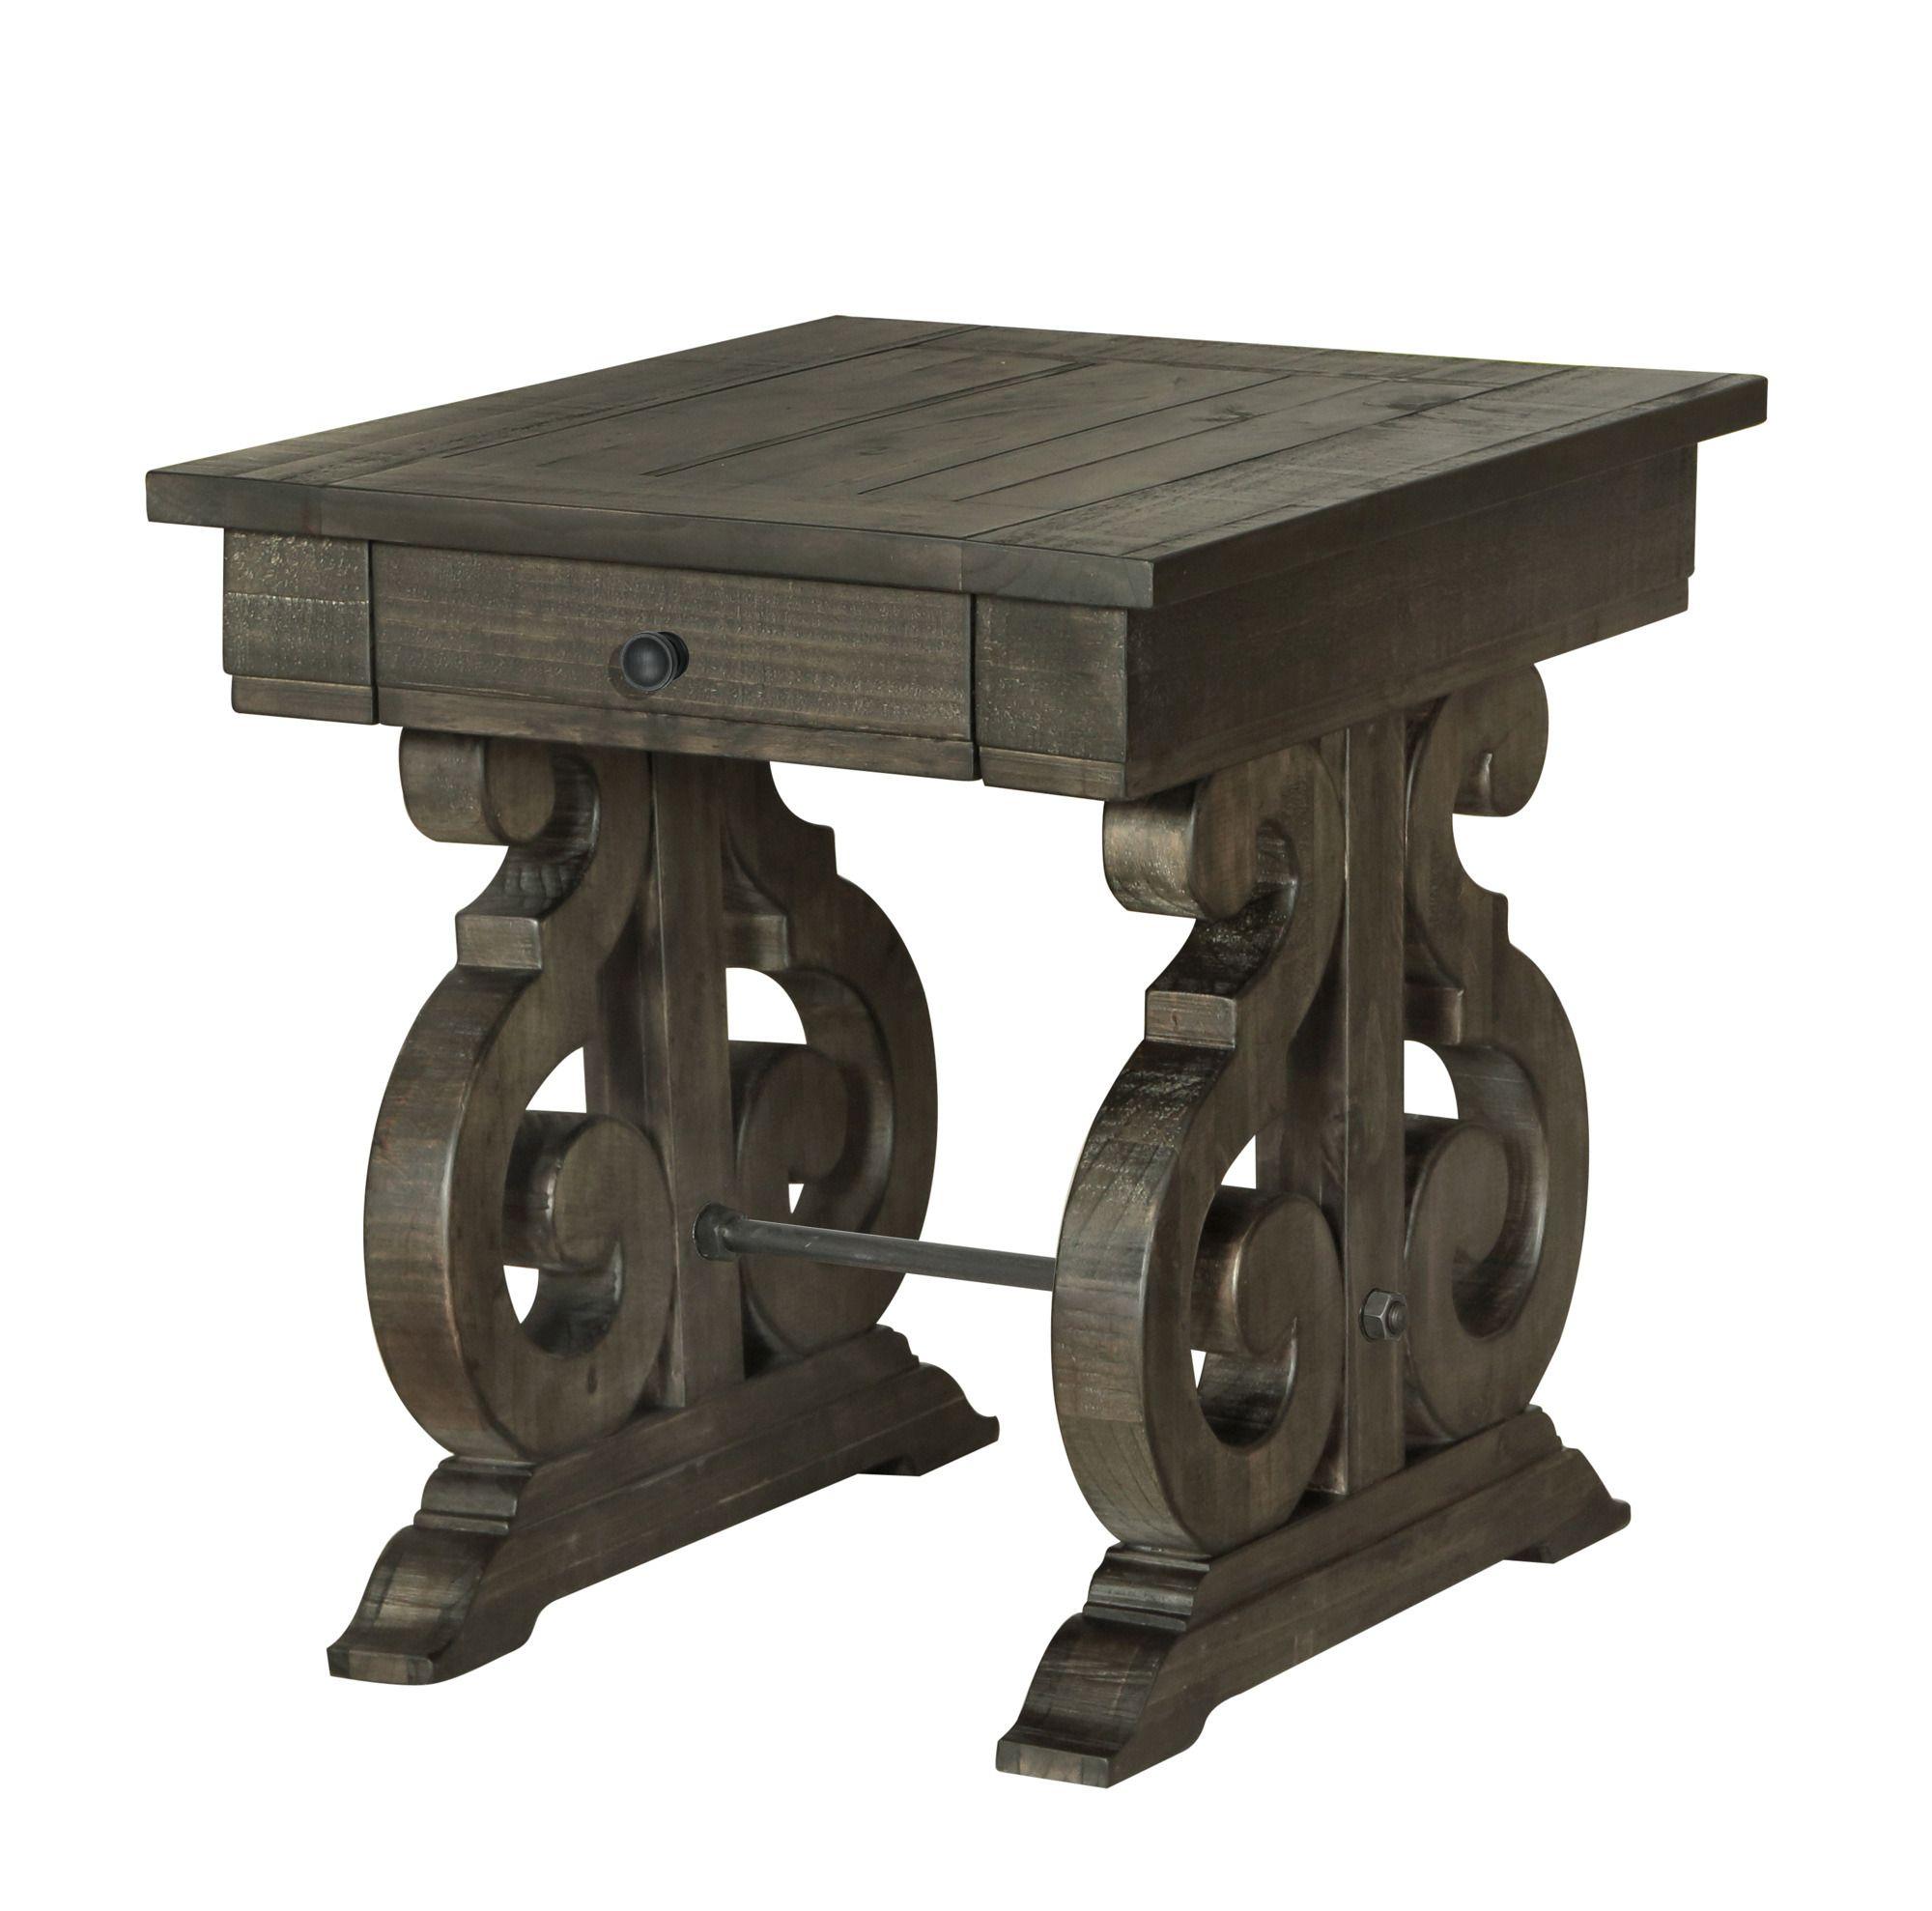 Bellamy deep weathered pine rectangular end table end